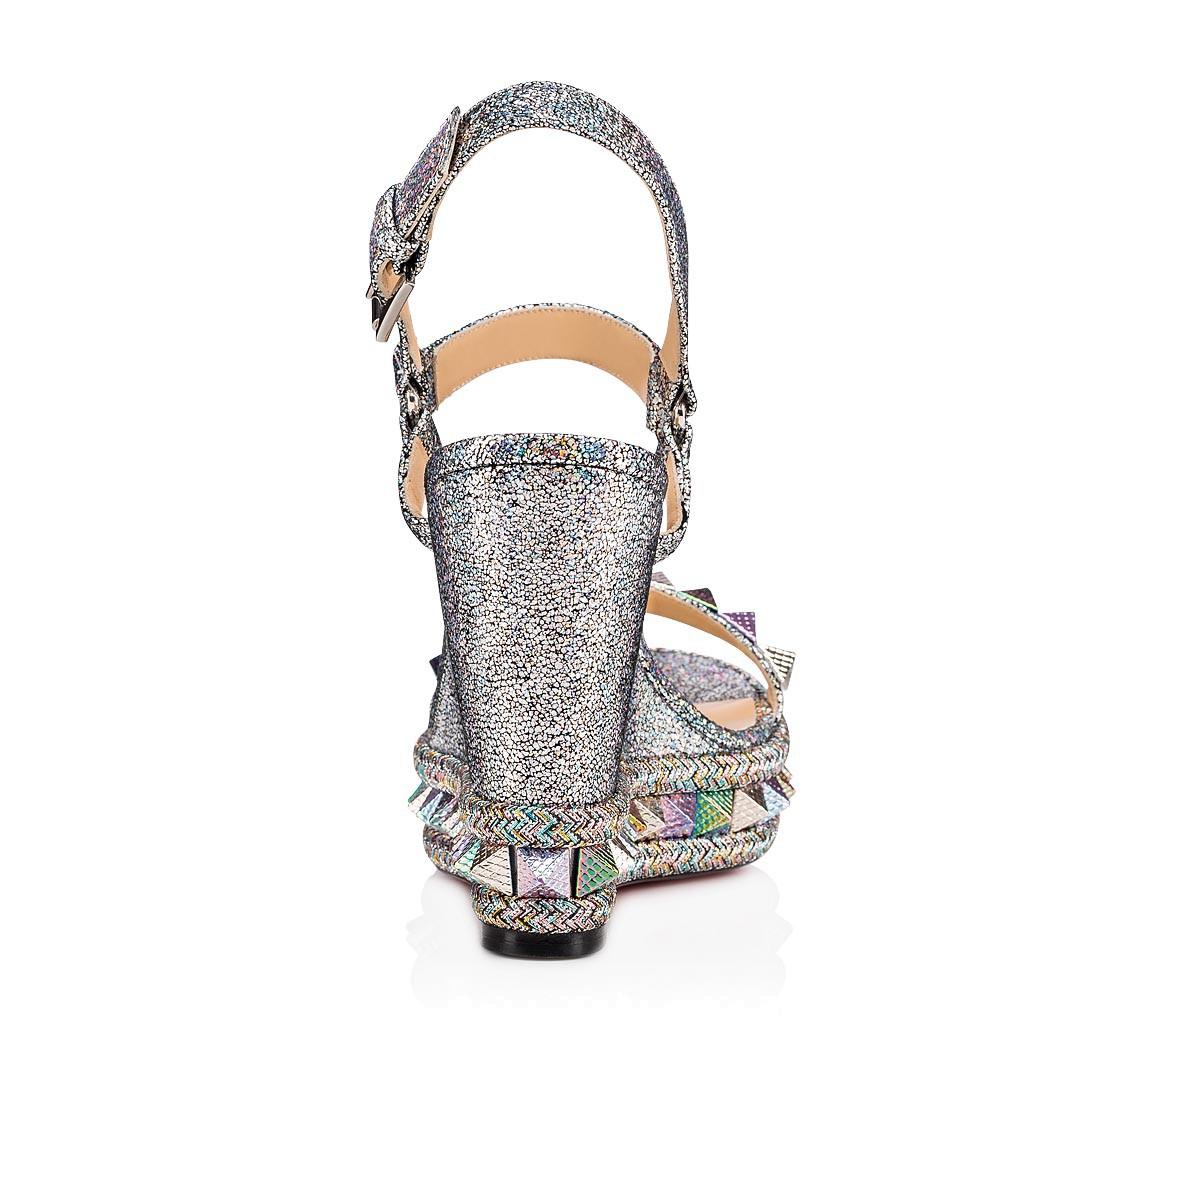 Shoes - Pyraclou Nappa Mica - Christian Louboutin